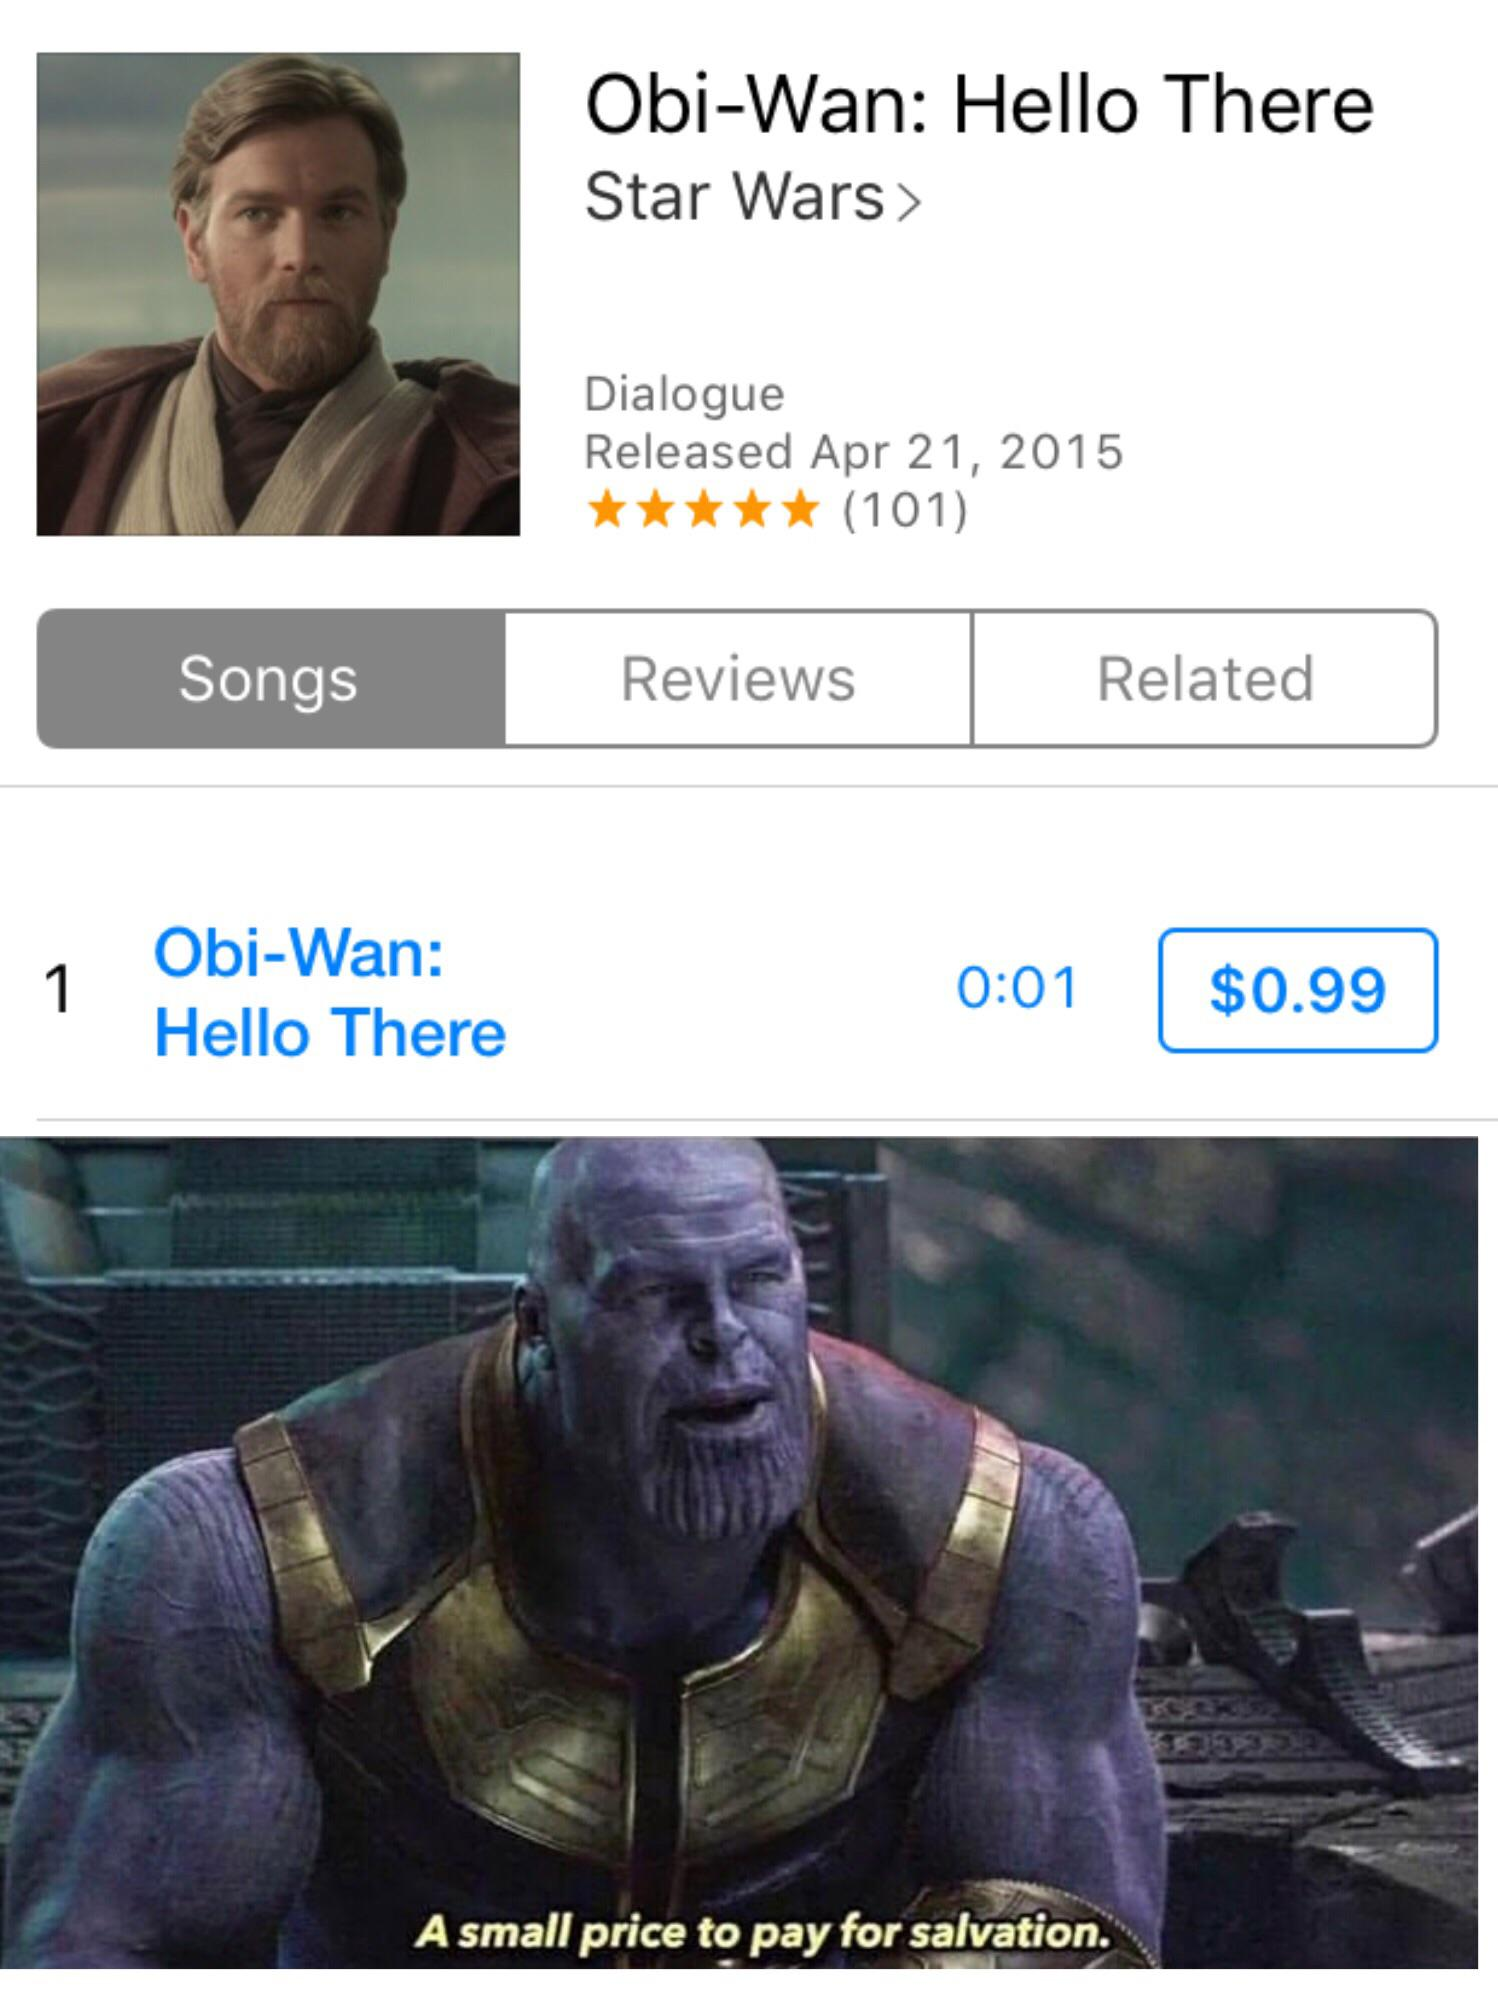 General Kenobi R Prequelmemes Prequel Memes Know Your Meme